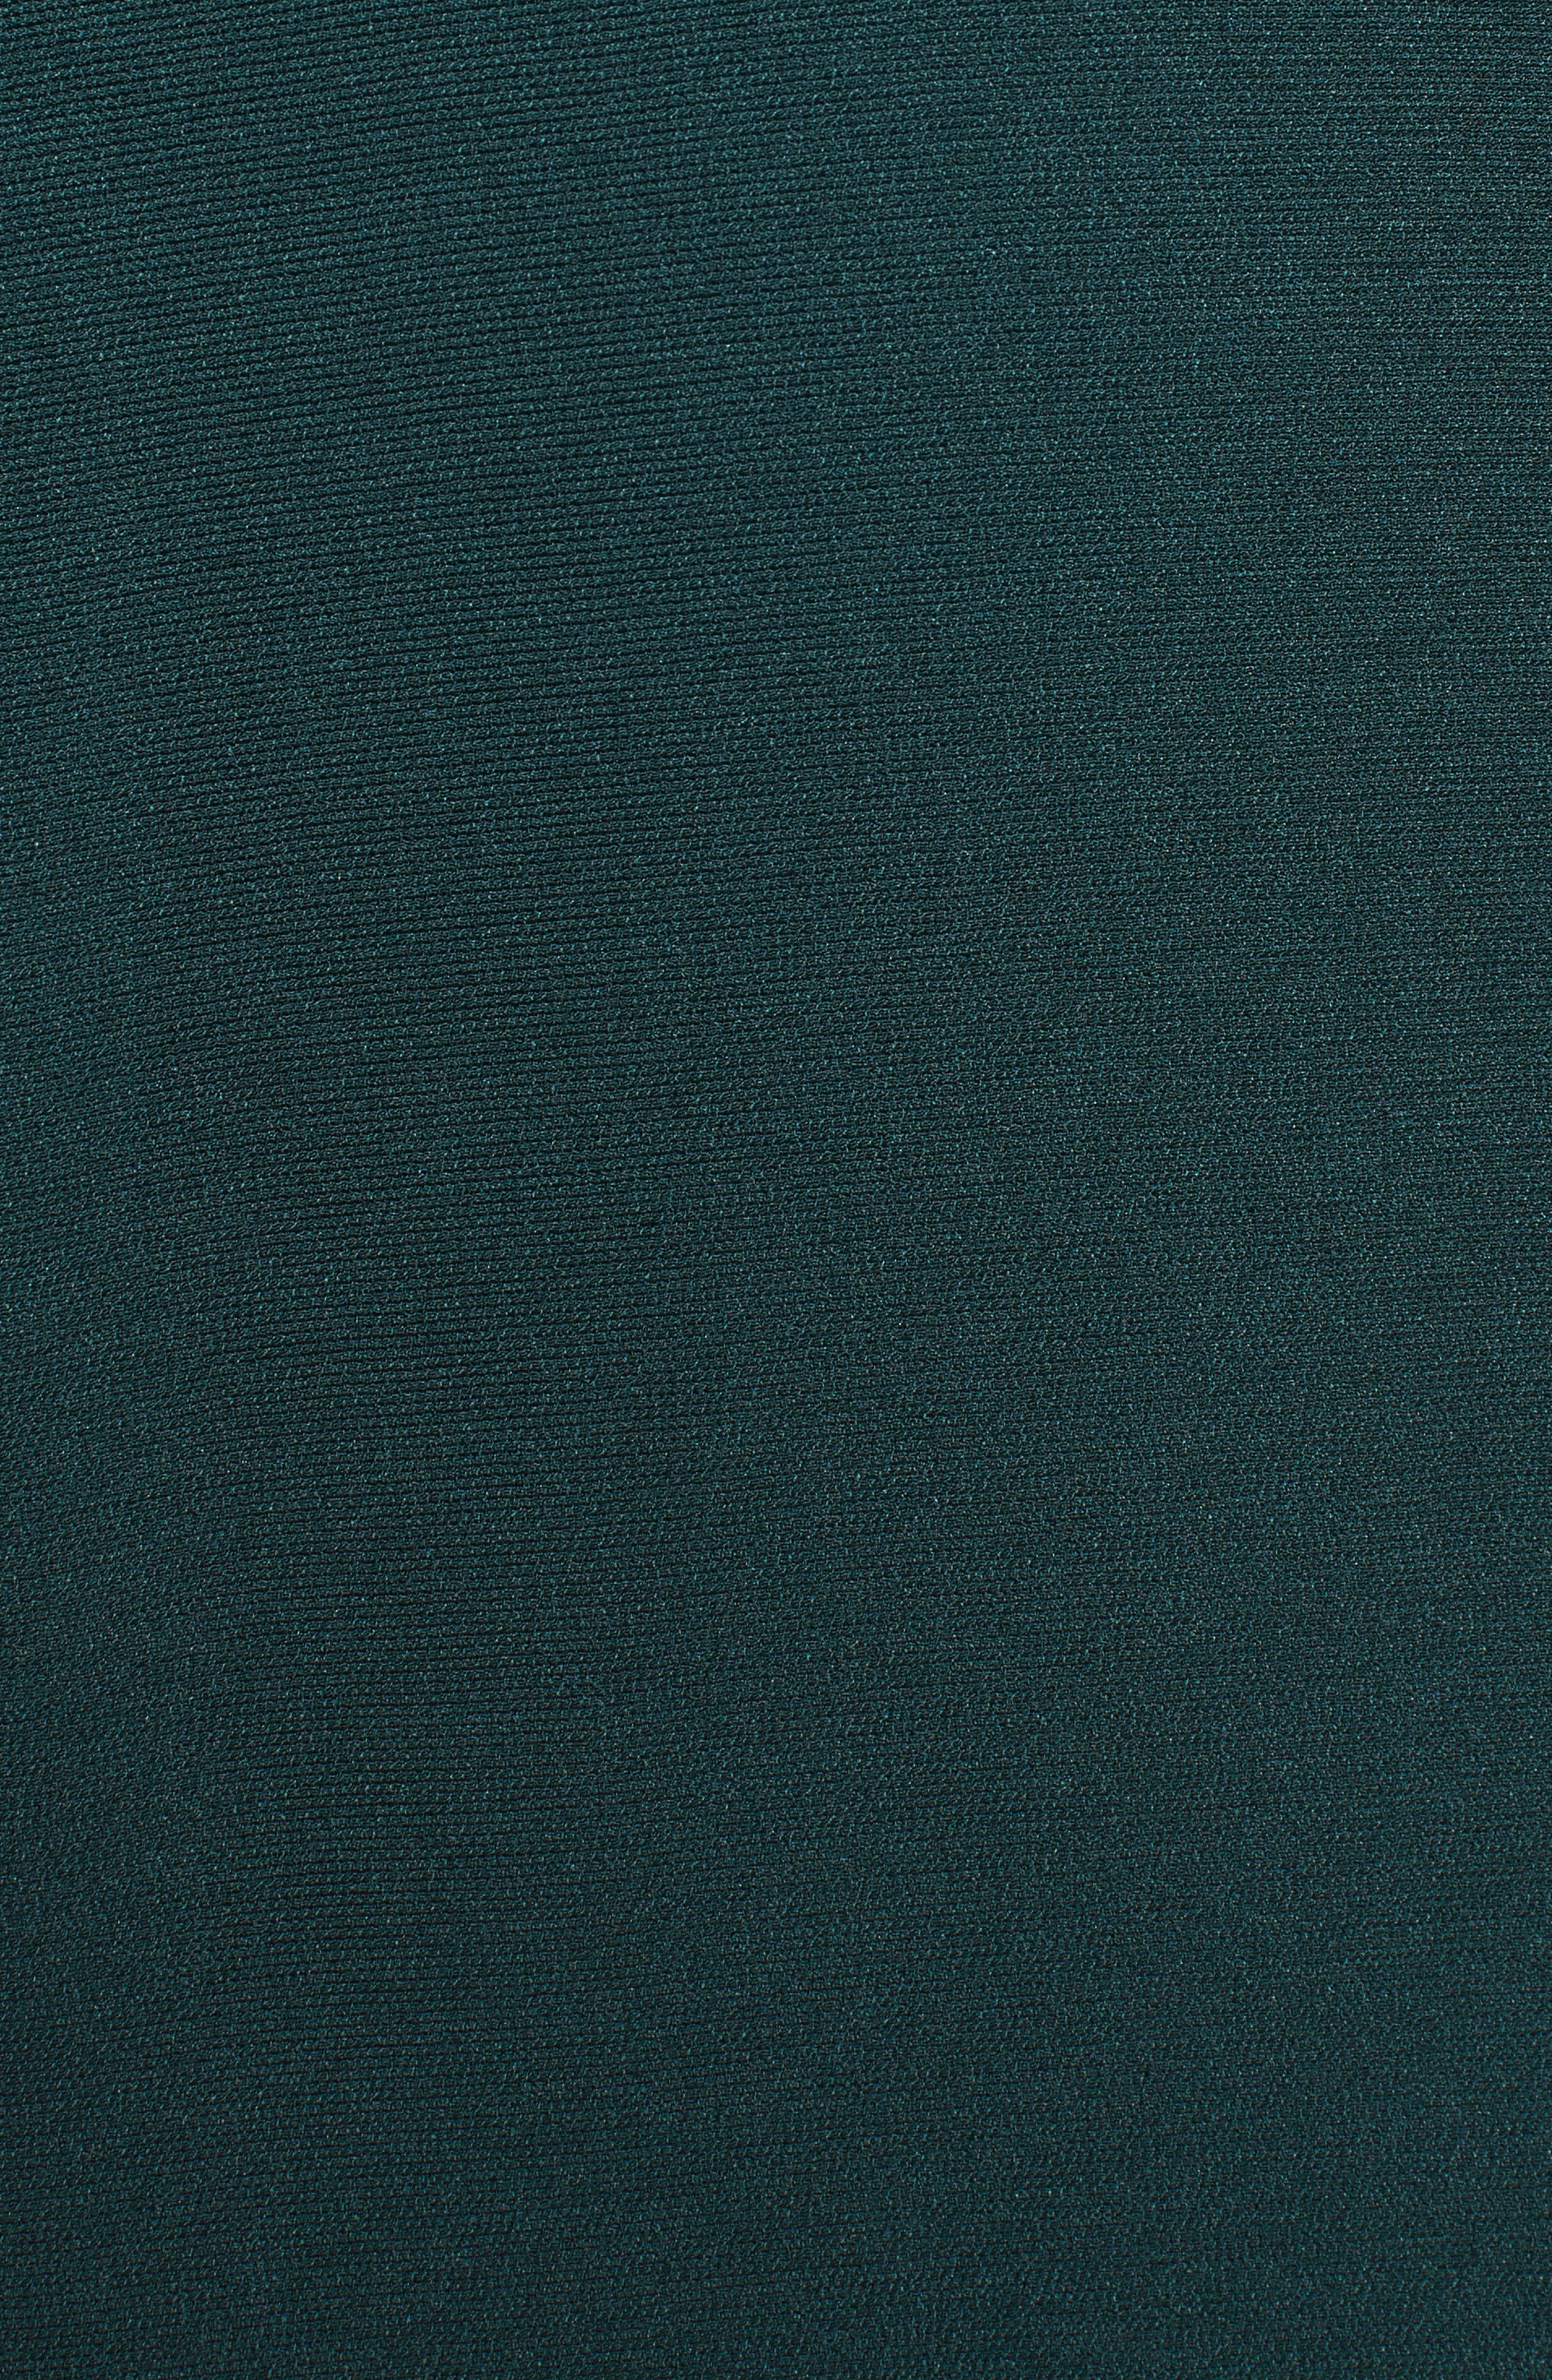 Dalesana Sheath Dress,                             Alternate thumbnail 5, color,                             301